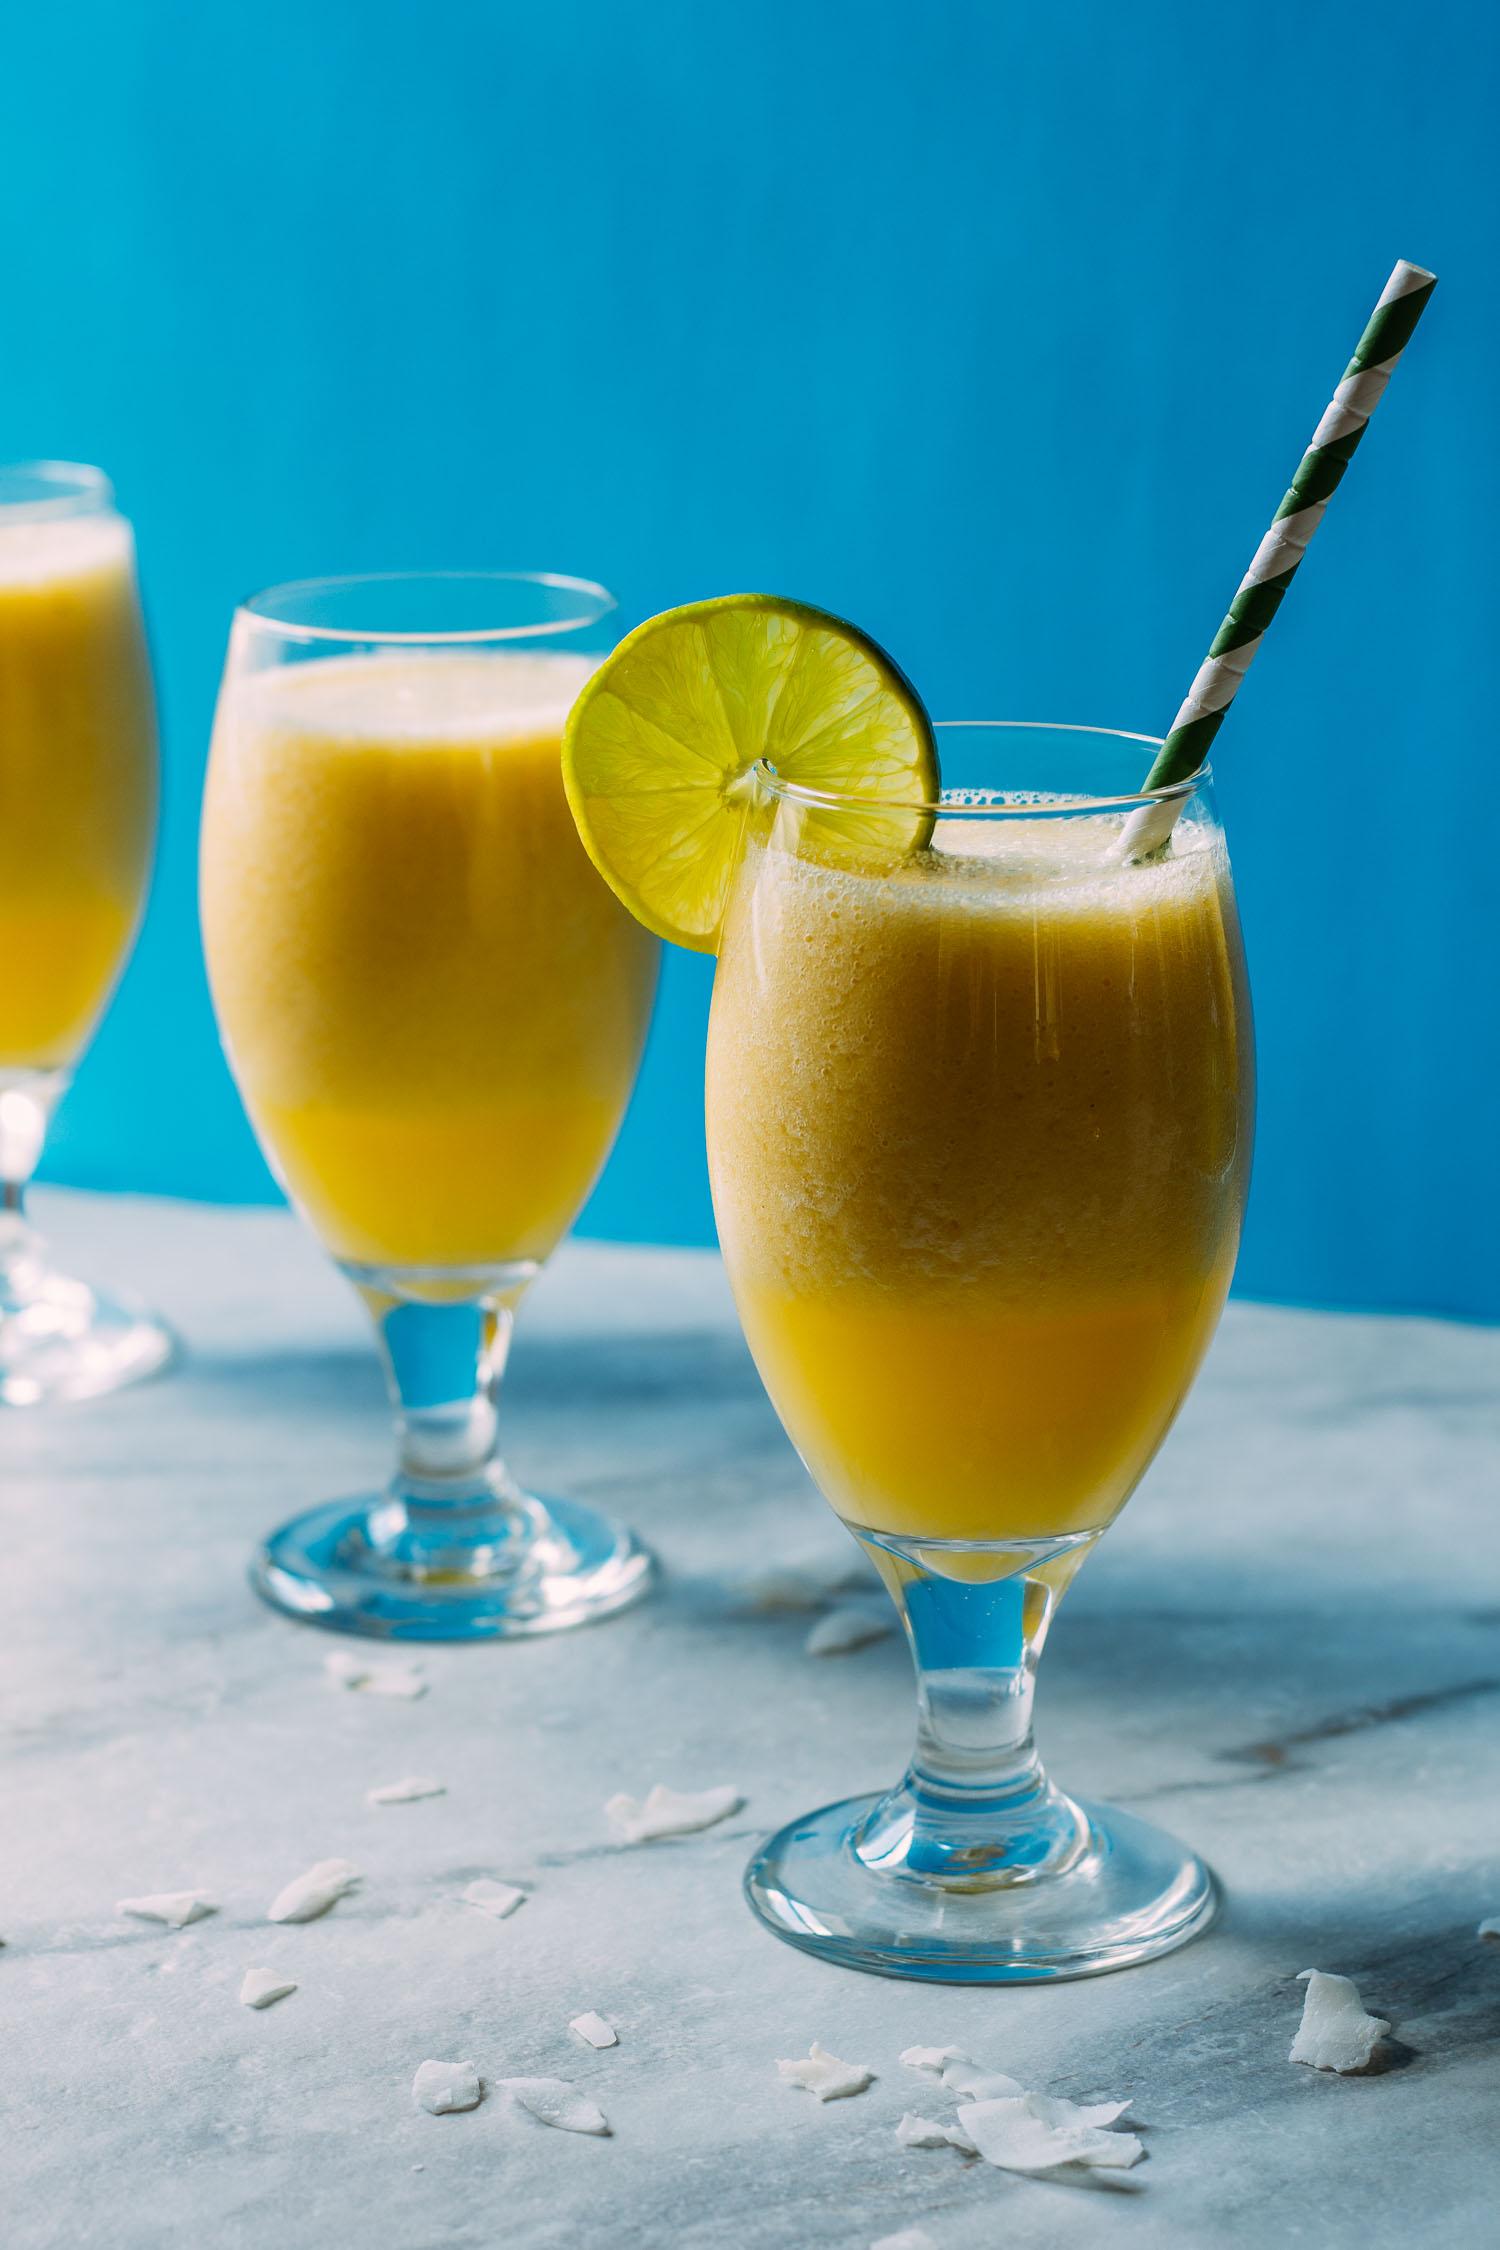 Refreshingly Lite Pina Colada Mango Smoothie #smoothie #mango #pina colada #pineapple #recipe